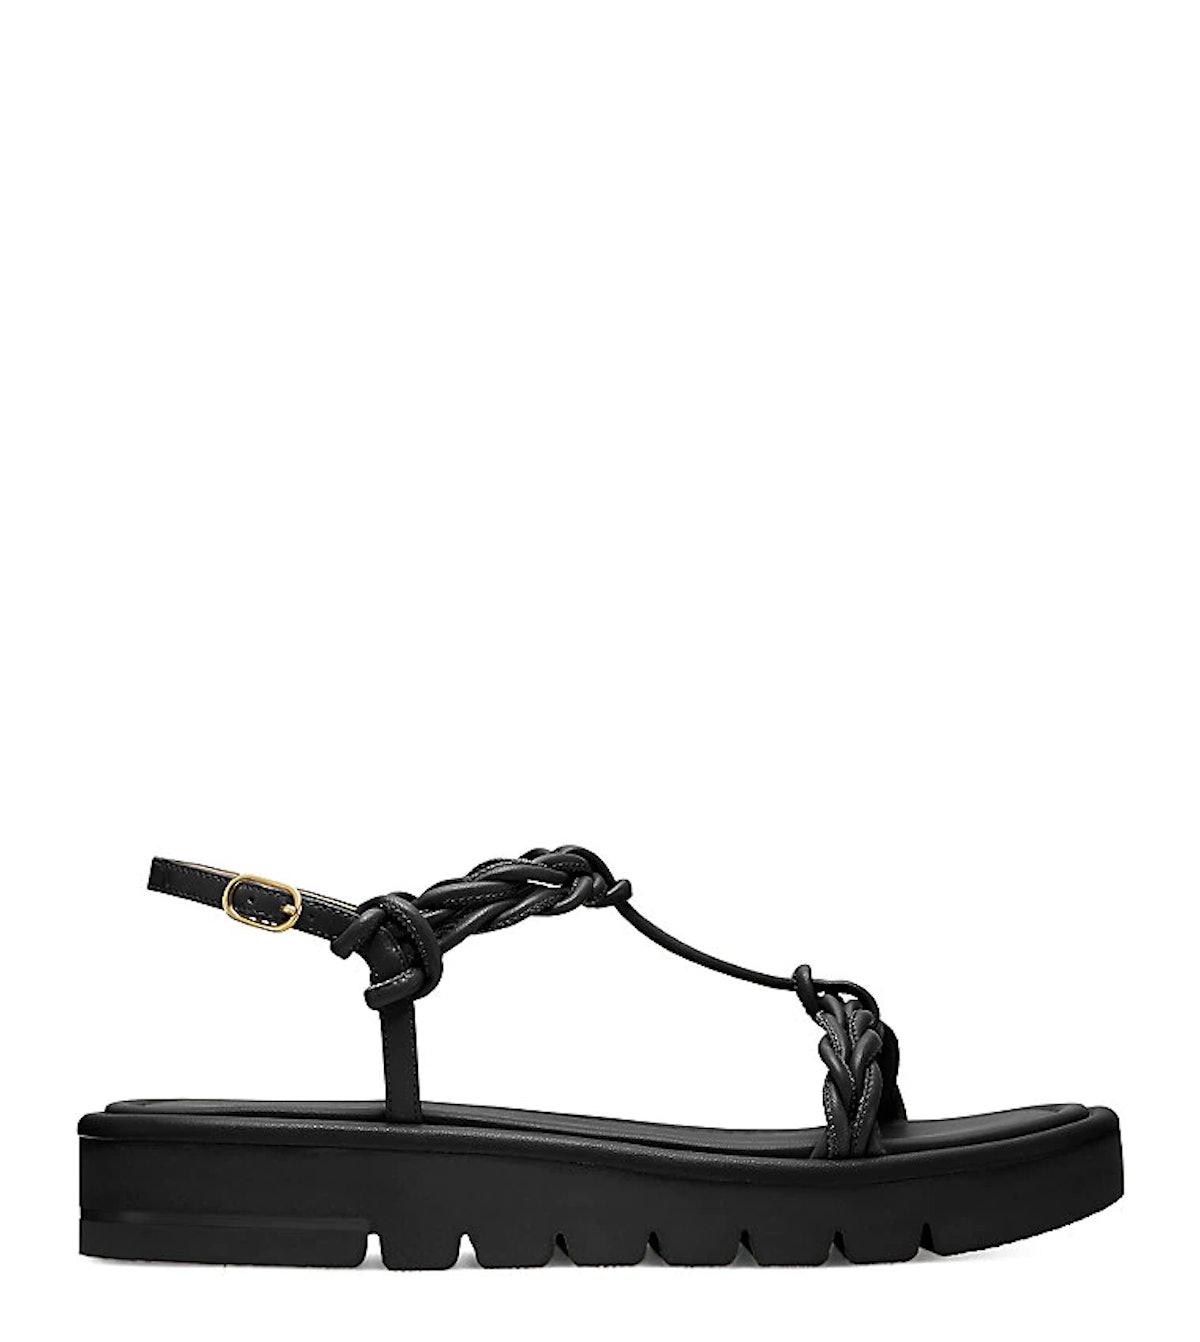 Calypso Lift Sandal